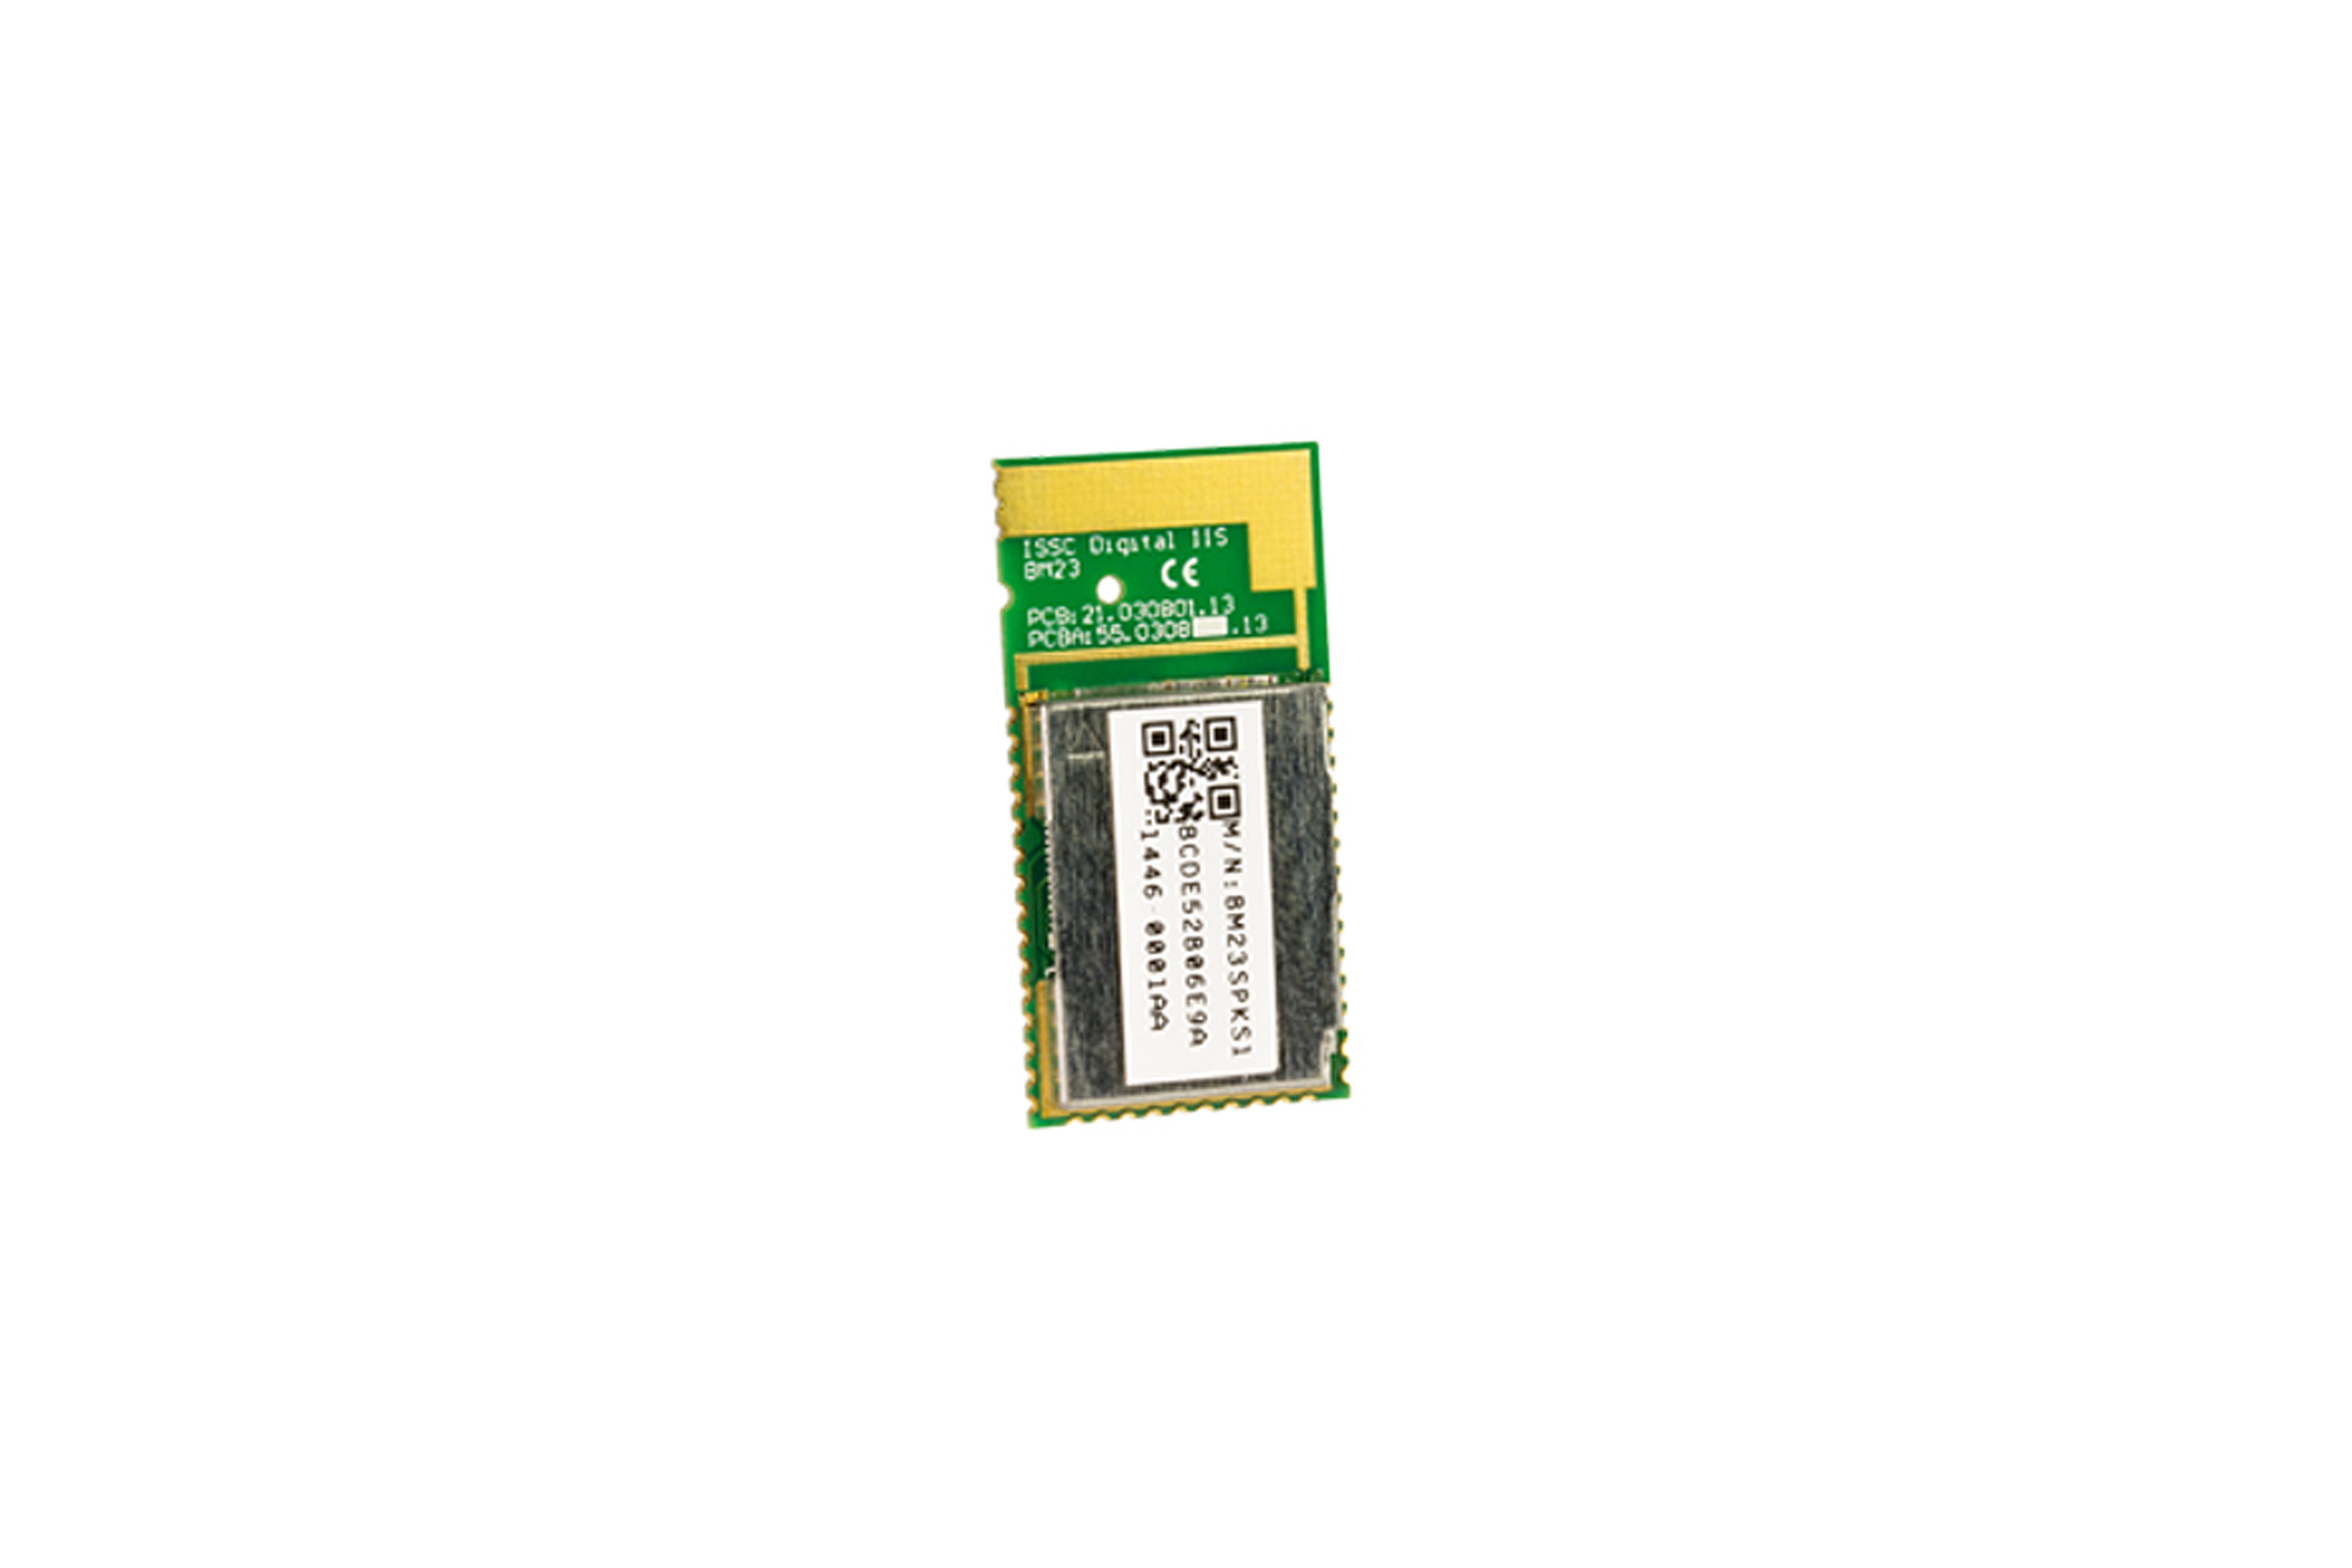 Modulo Bluetooth 4.1 BDR/EDR classe 2